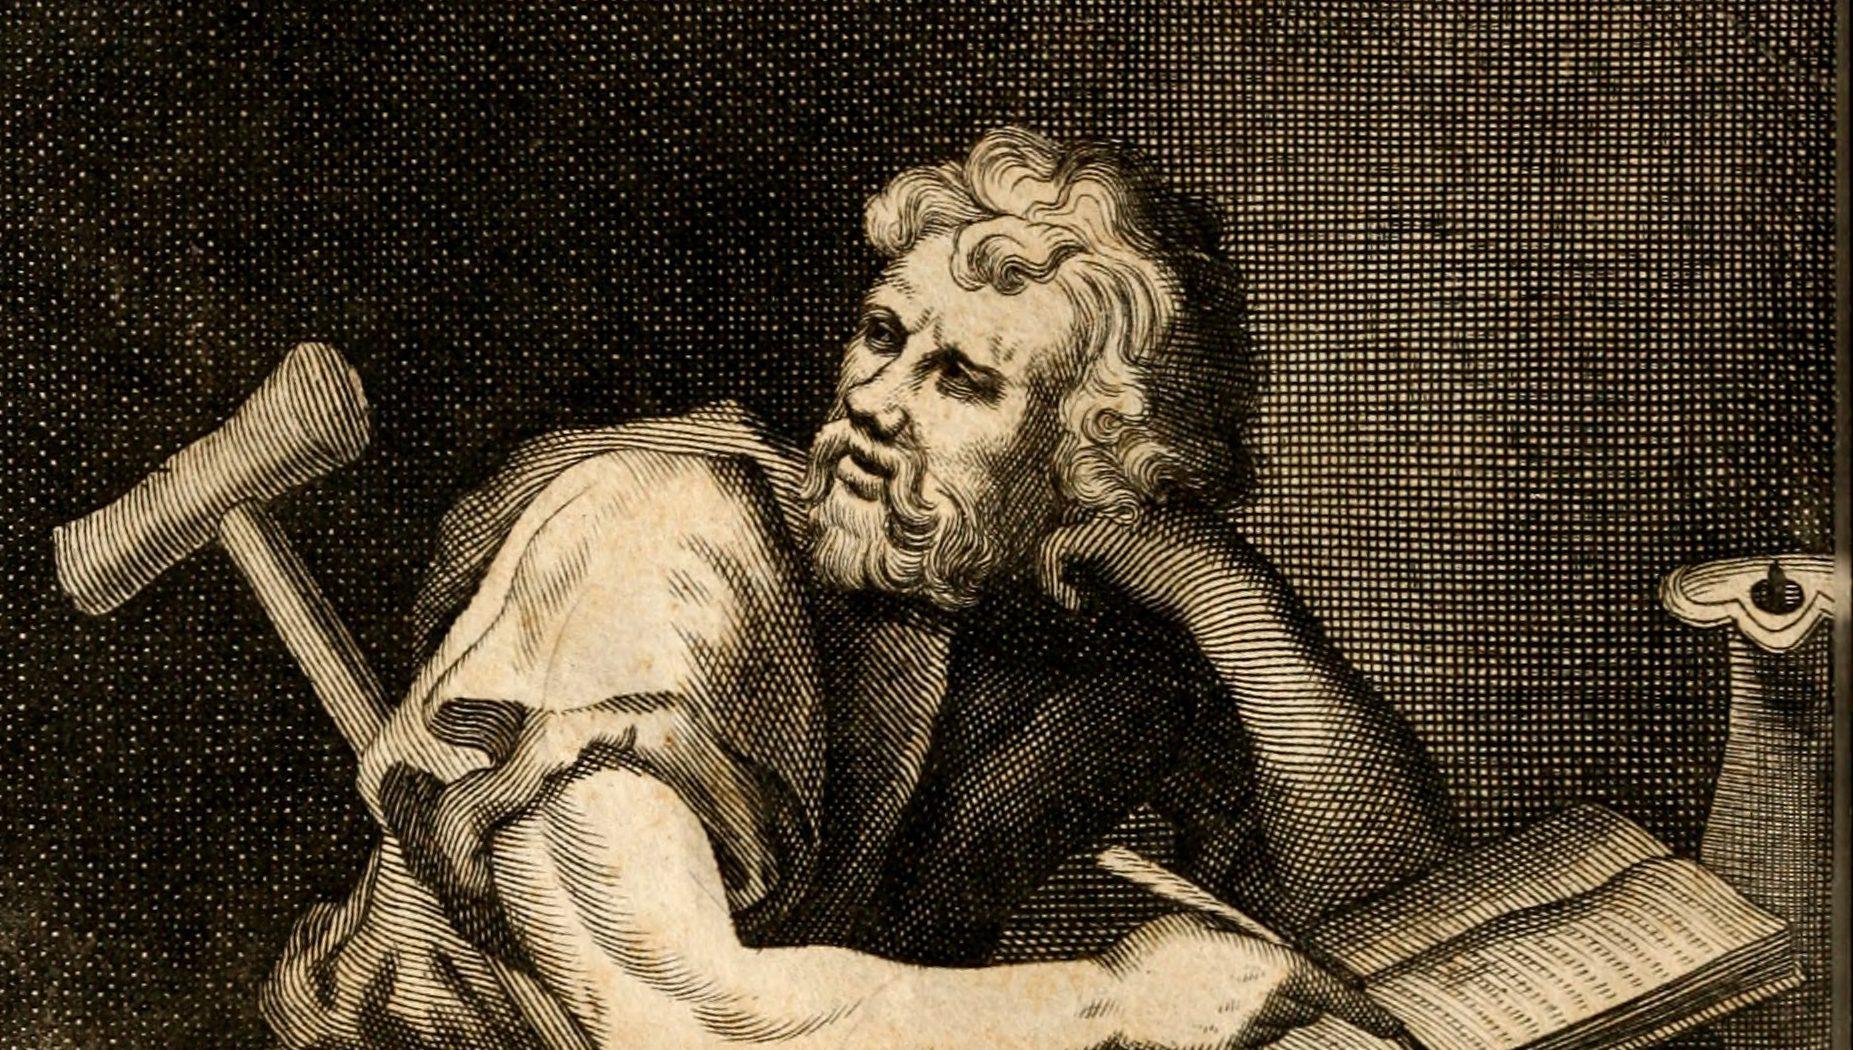 Imaginary portrait of Epictetus.